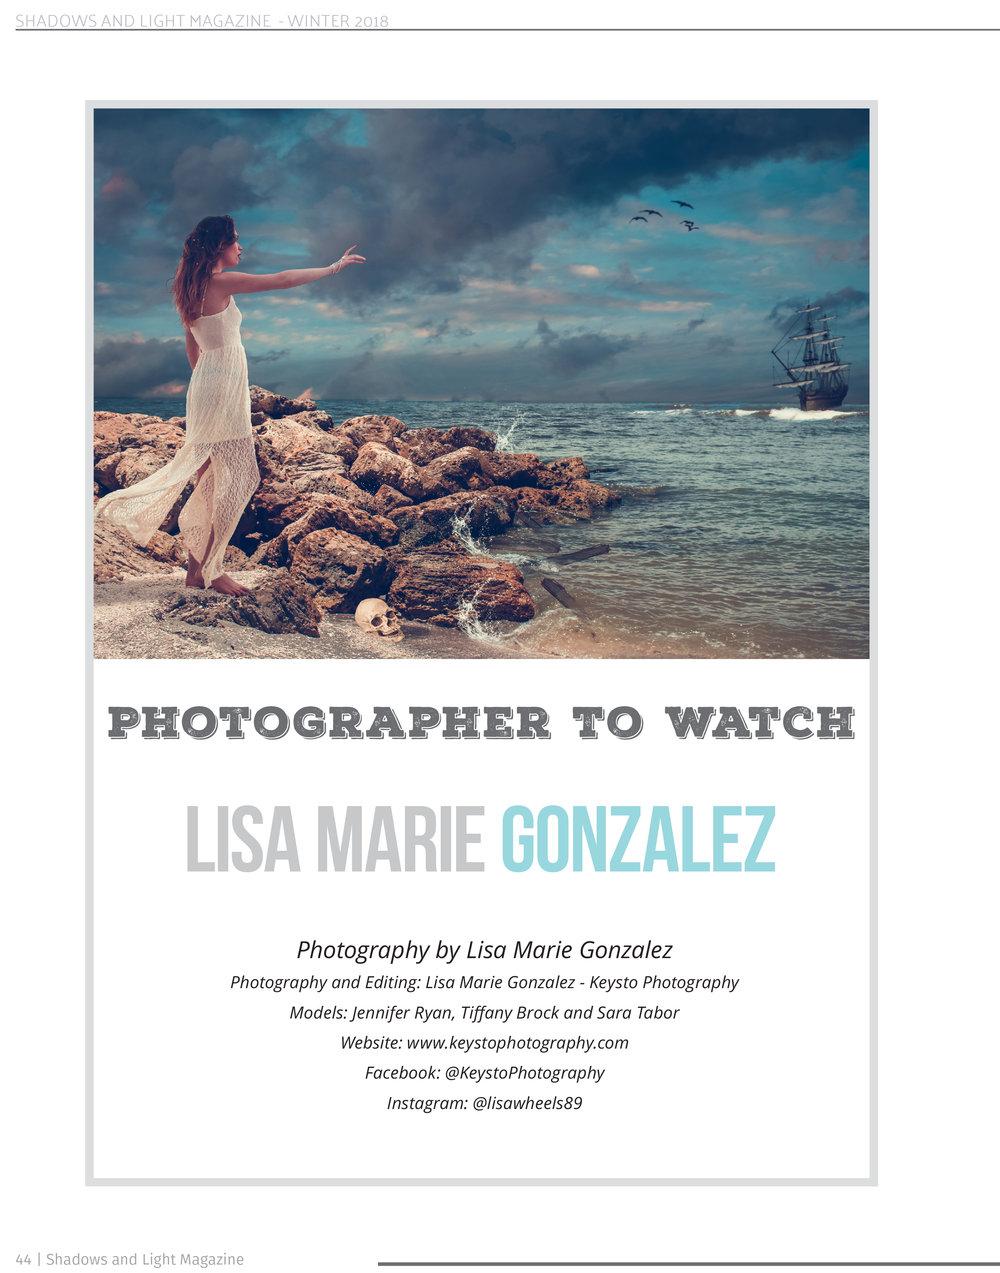 Lisa Marie Gonzalez